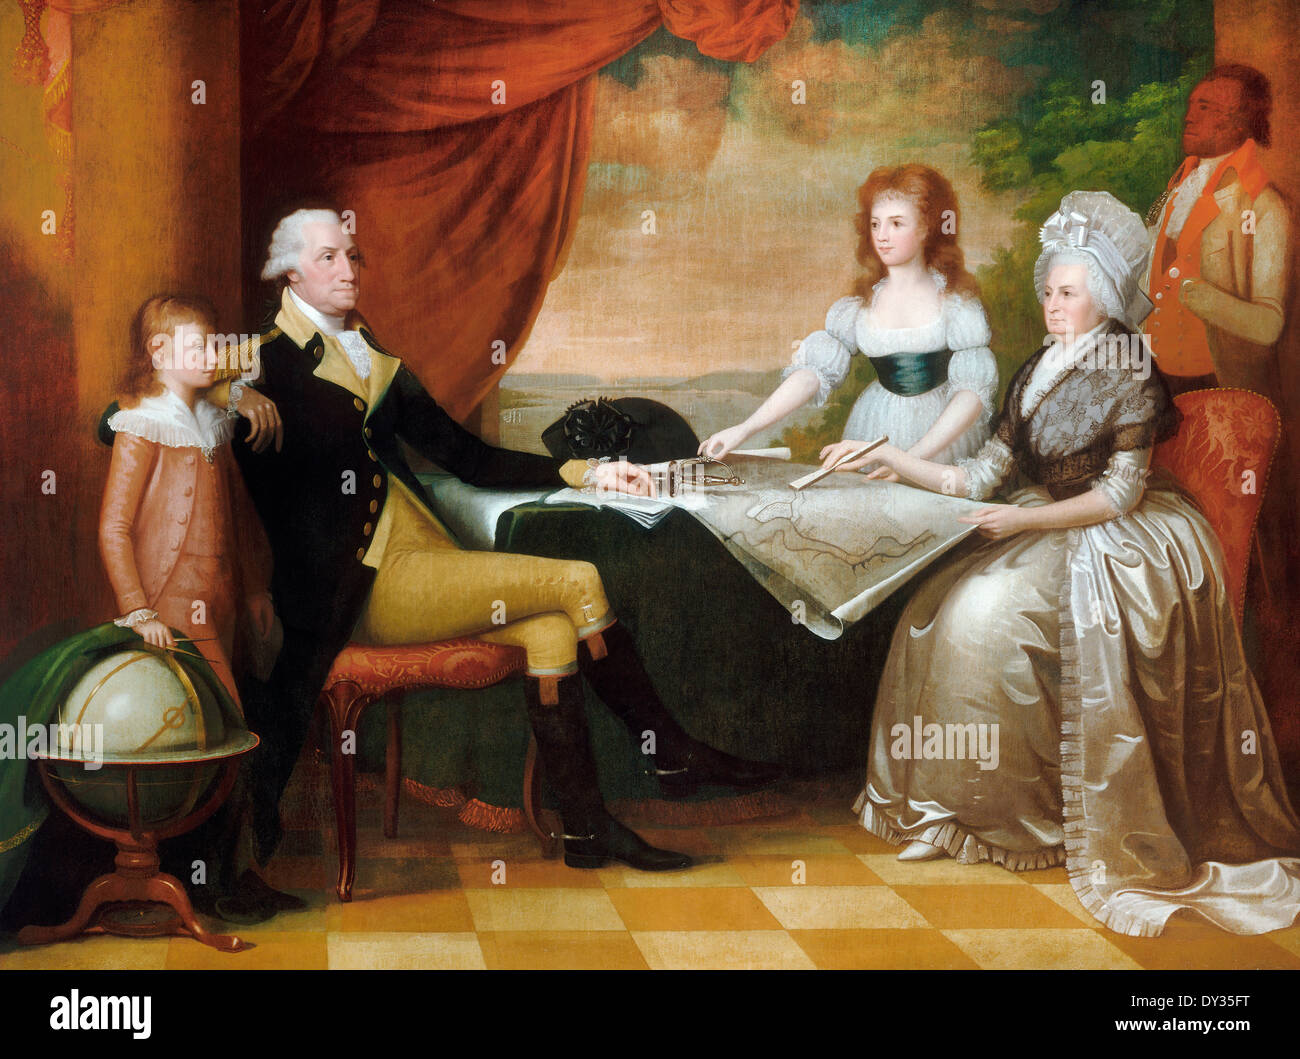 Edward Savage, The Washington Family 1789-1796 Oil on canvas. National Gallery of Art, Washington, D.C., USA. - Stock Image